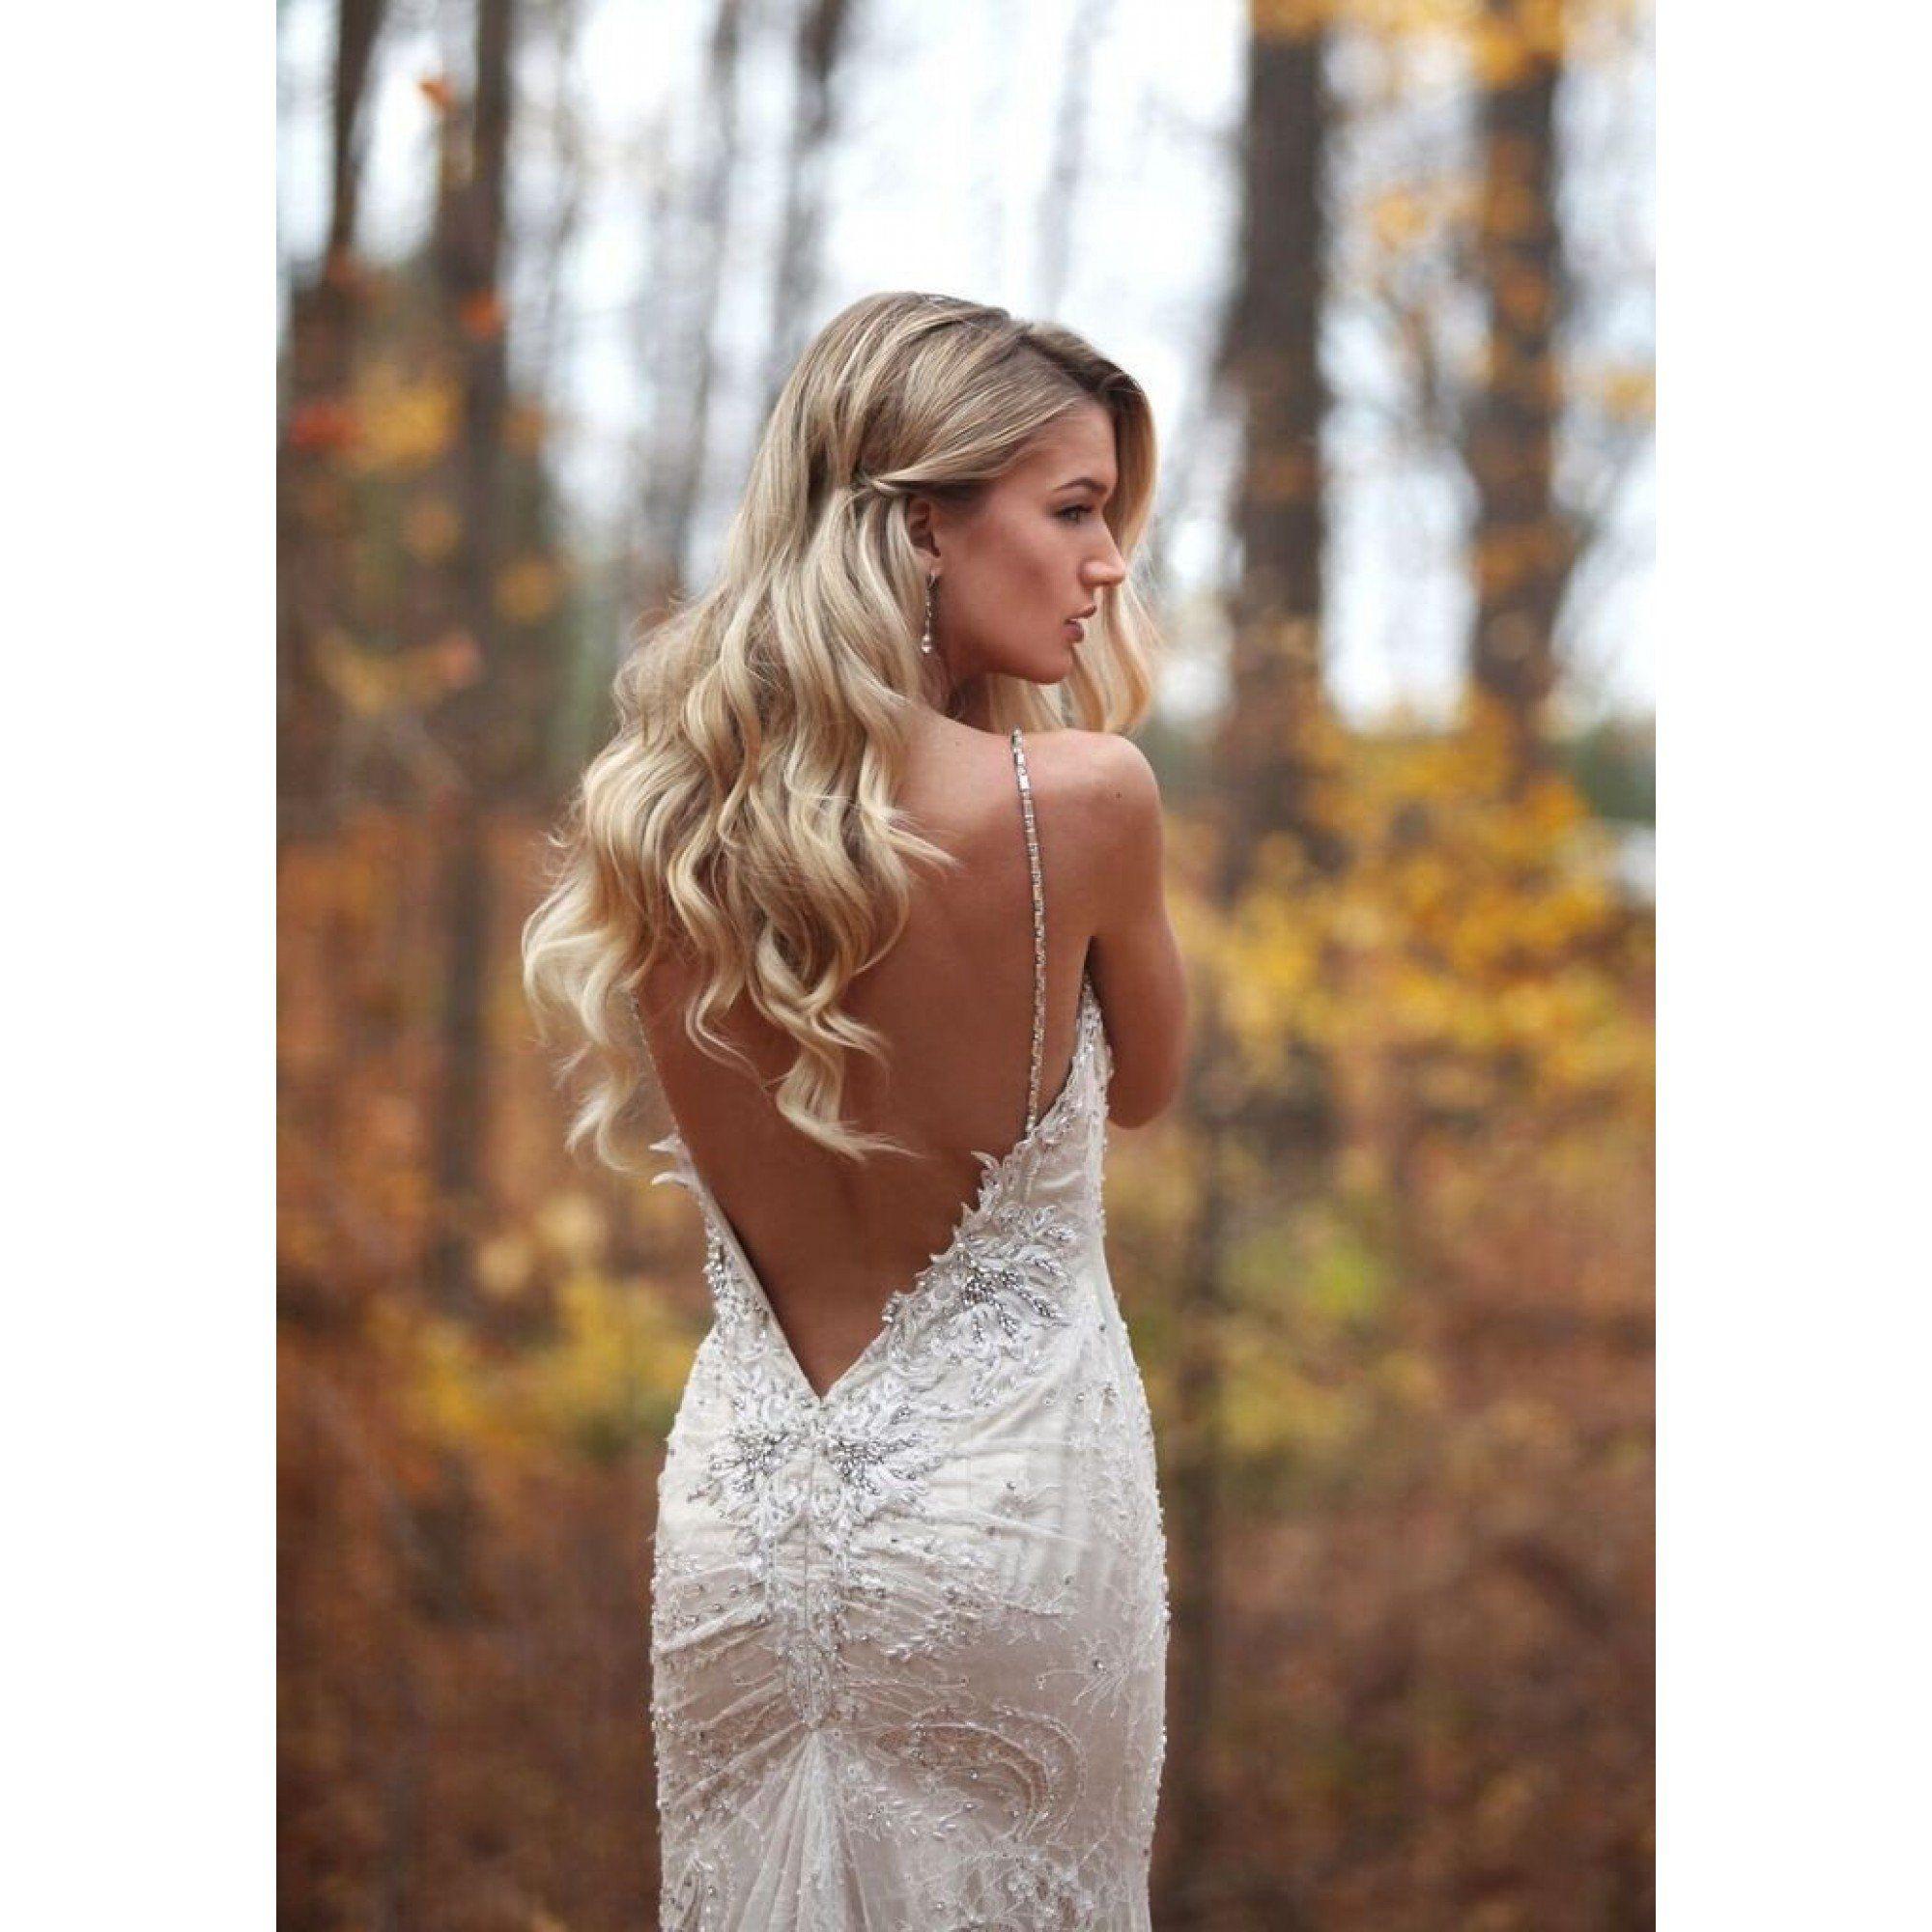 Marisa Bridal 111|Marisa Wedding dress 111|tampabridalshops.com ...